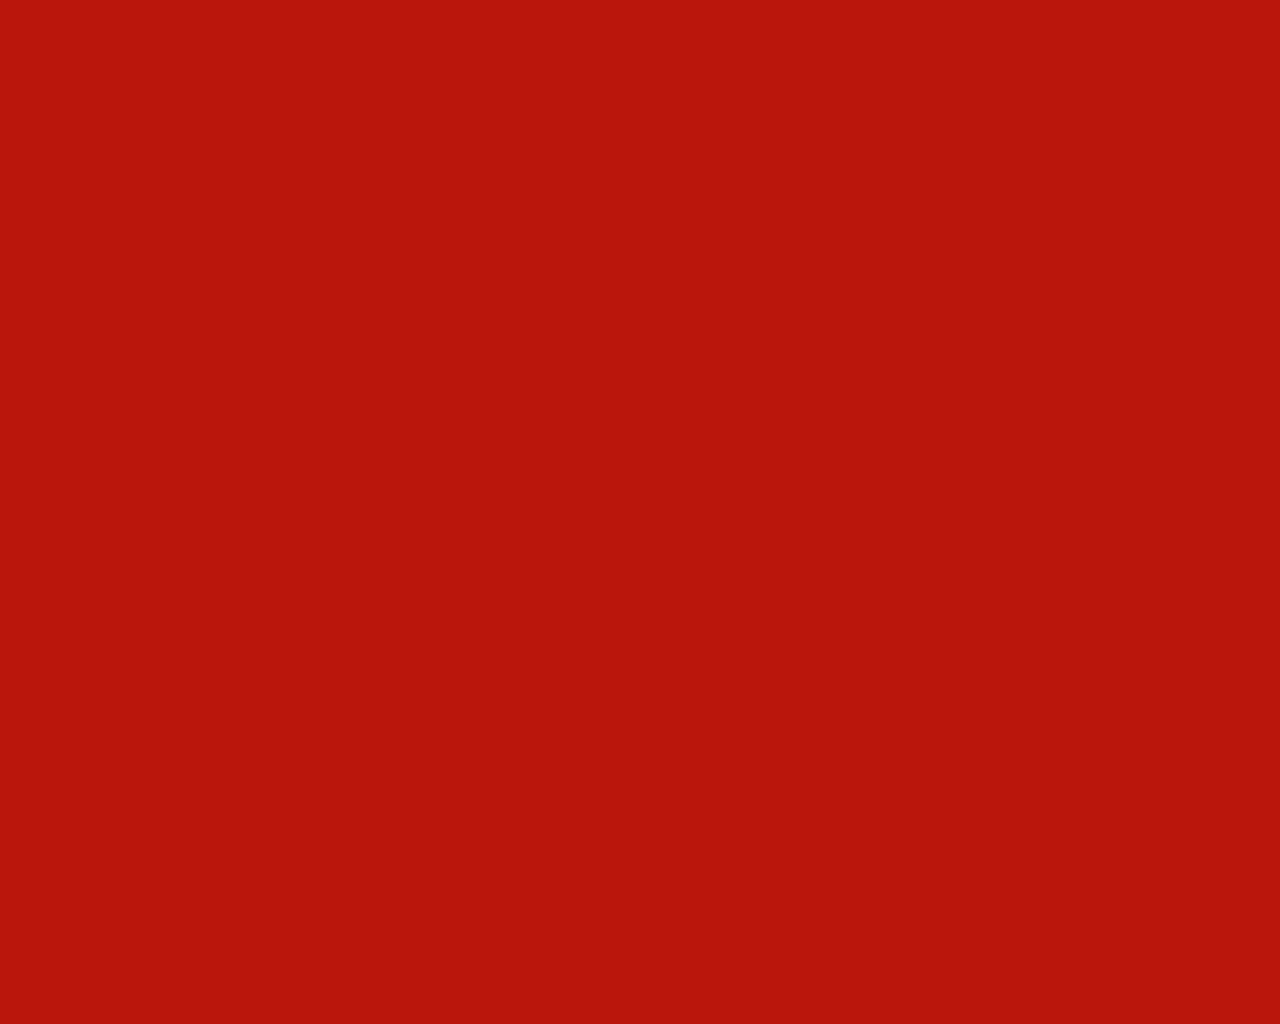 1280x1024 International Orange Engineering Solid Color Background